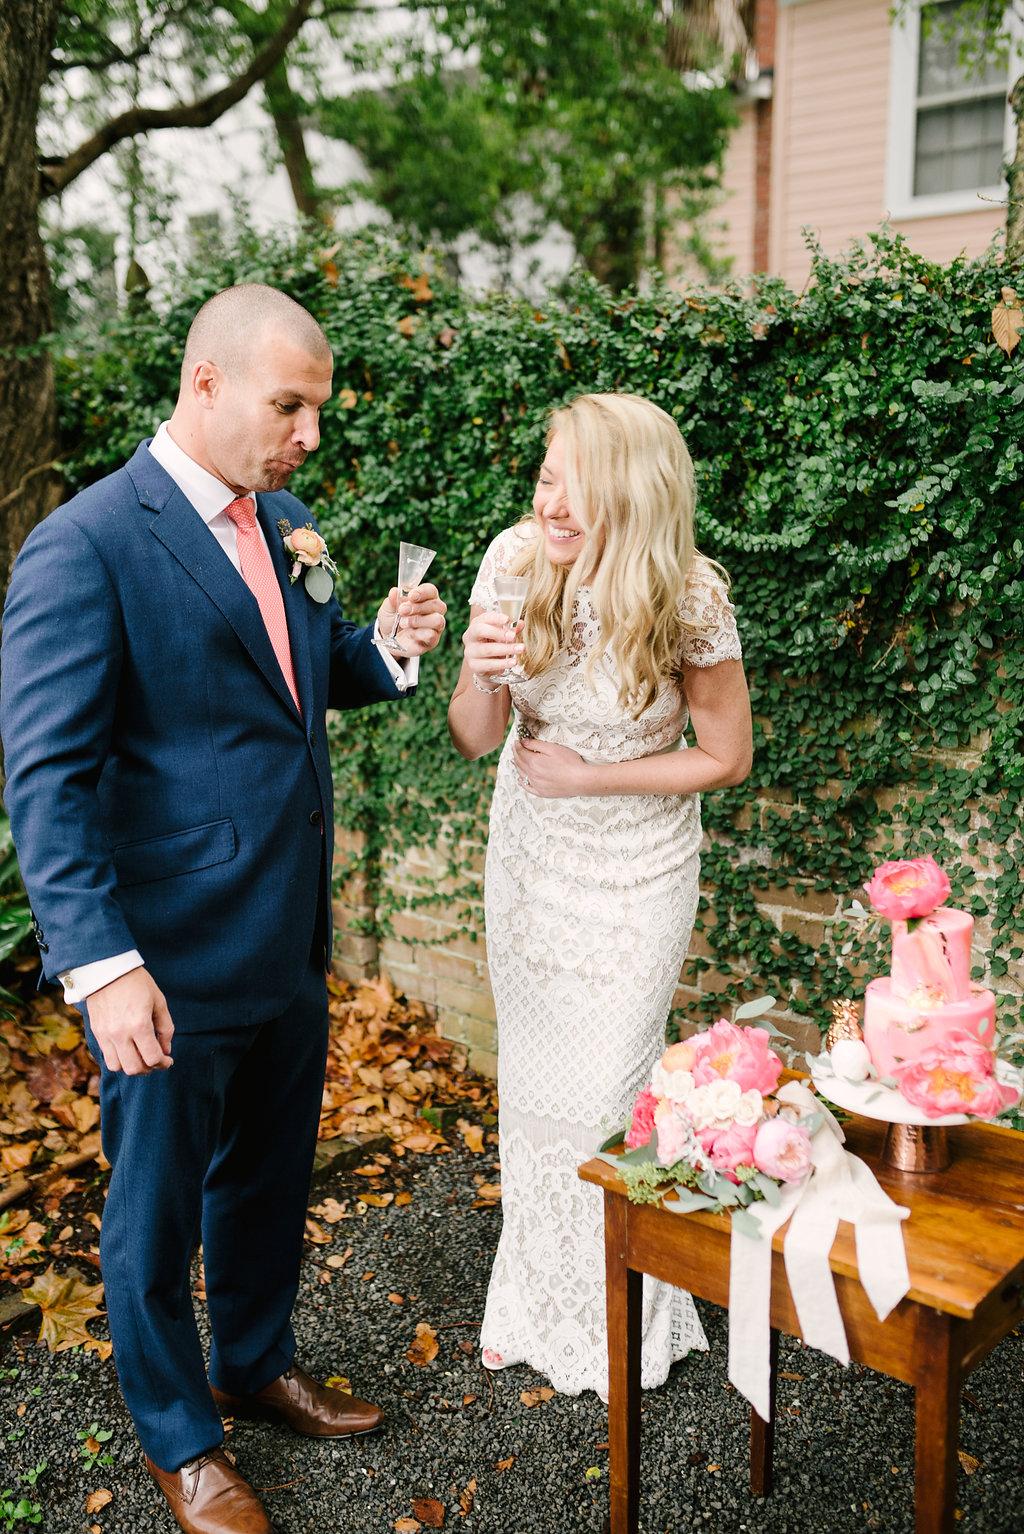 charleston elopement planners, scarlet plan & design, coral, tangerine, hot pink, peach intimate wedding  (9).jpg